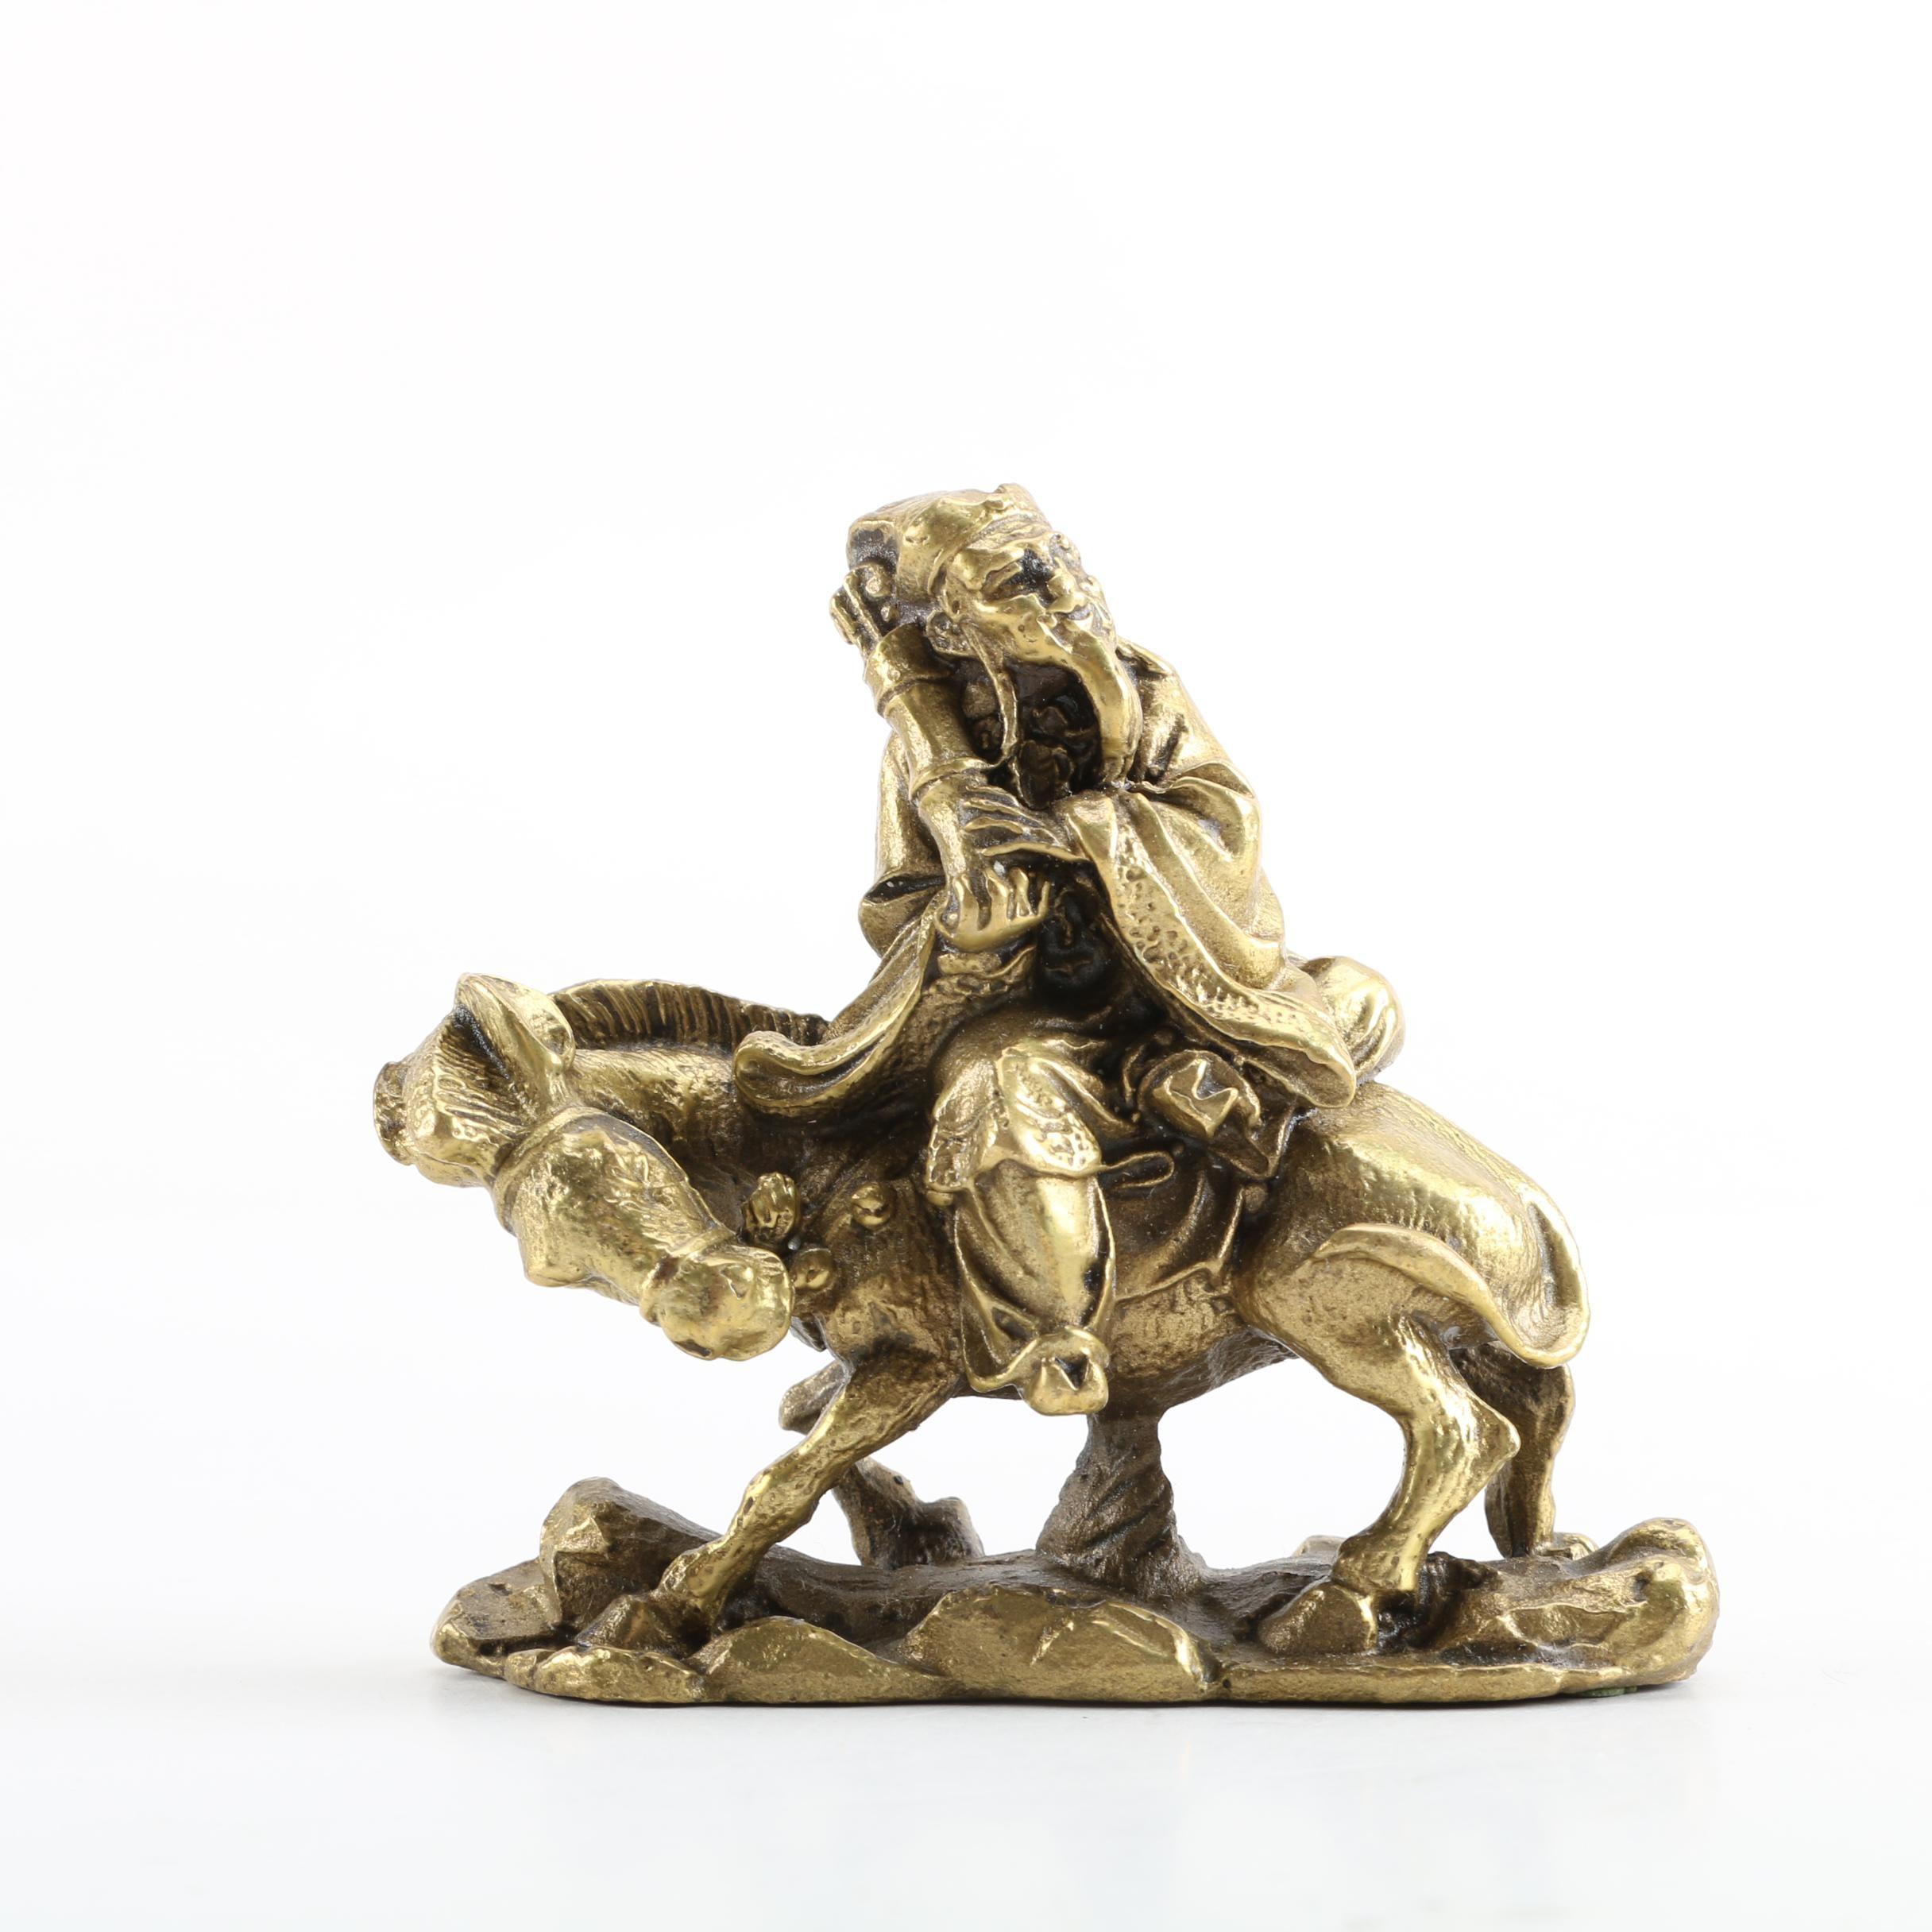 Chinese Metal Figurine of Laozi Riding a Donkey